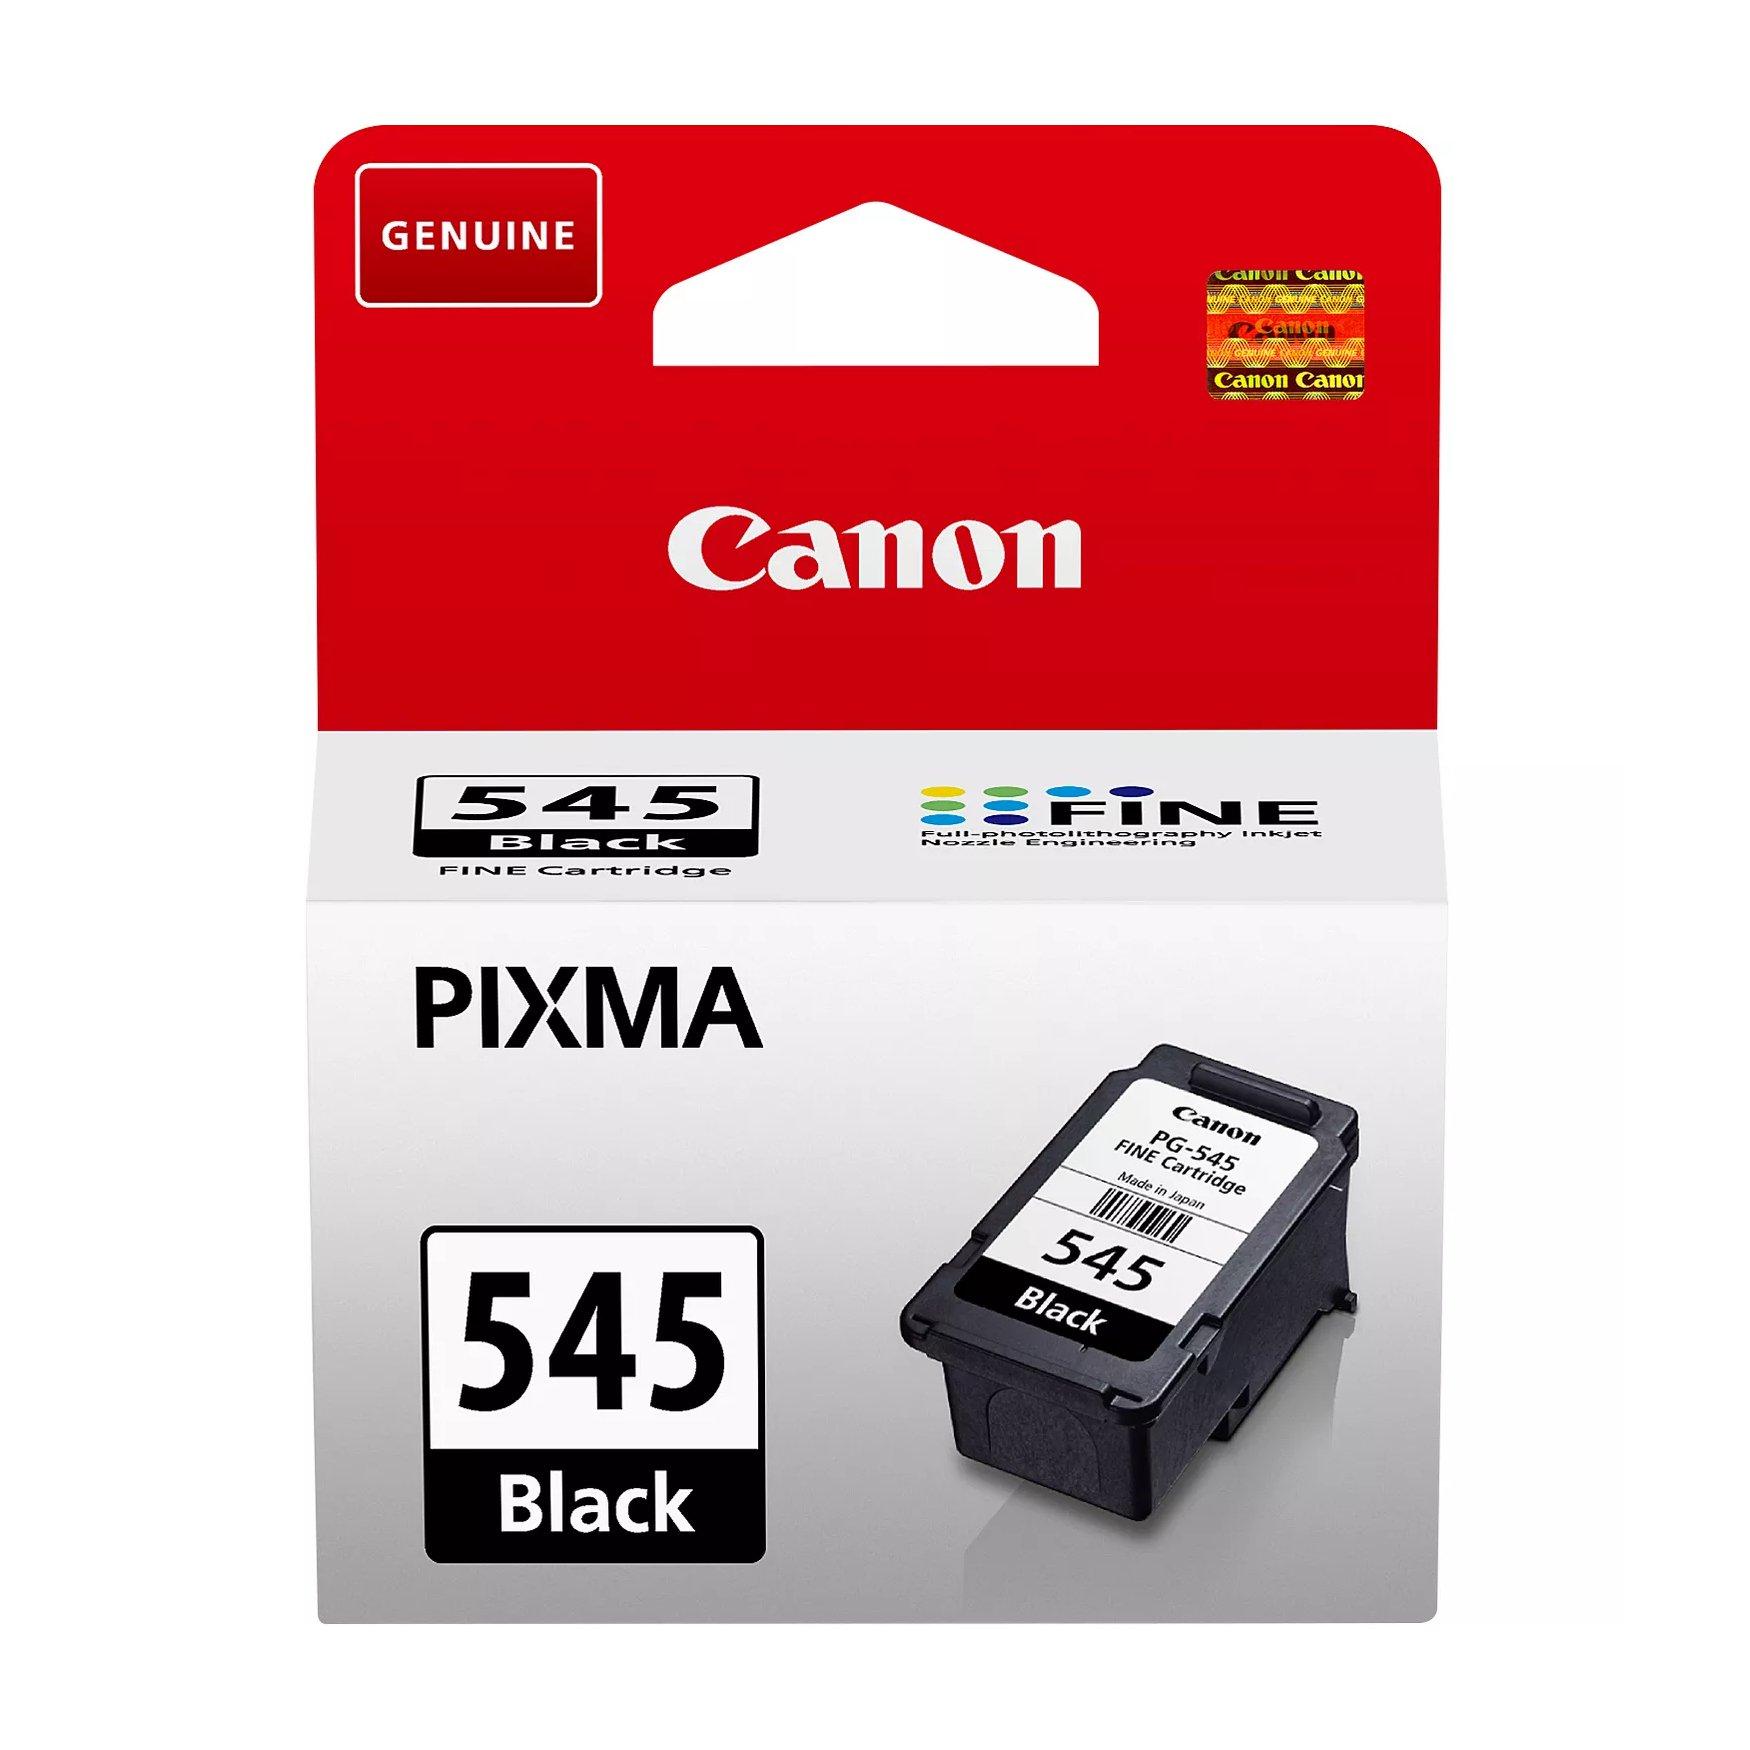 Canon No.545 Inkjet Cartridge Black PG-545 8287B001